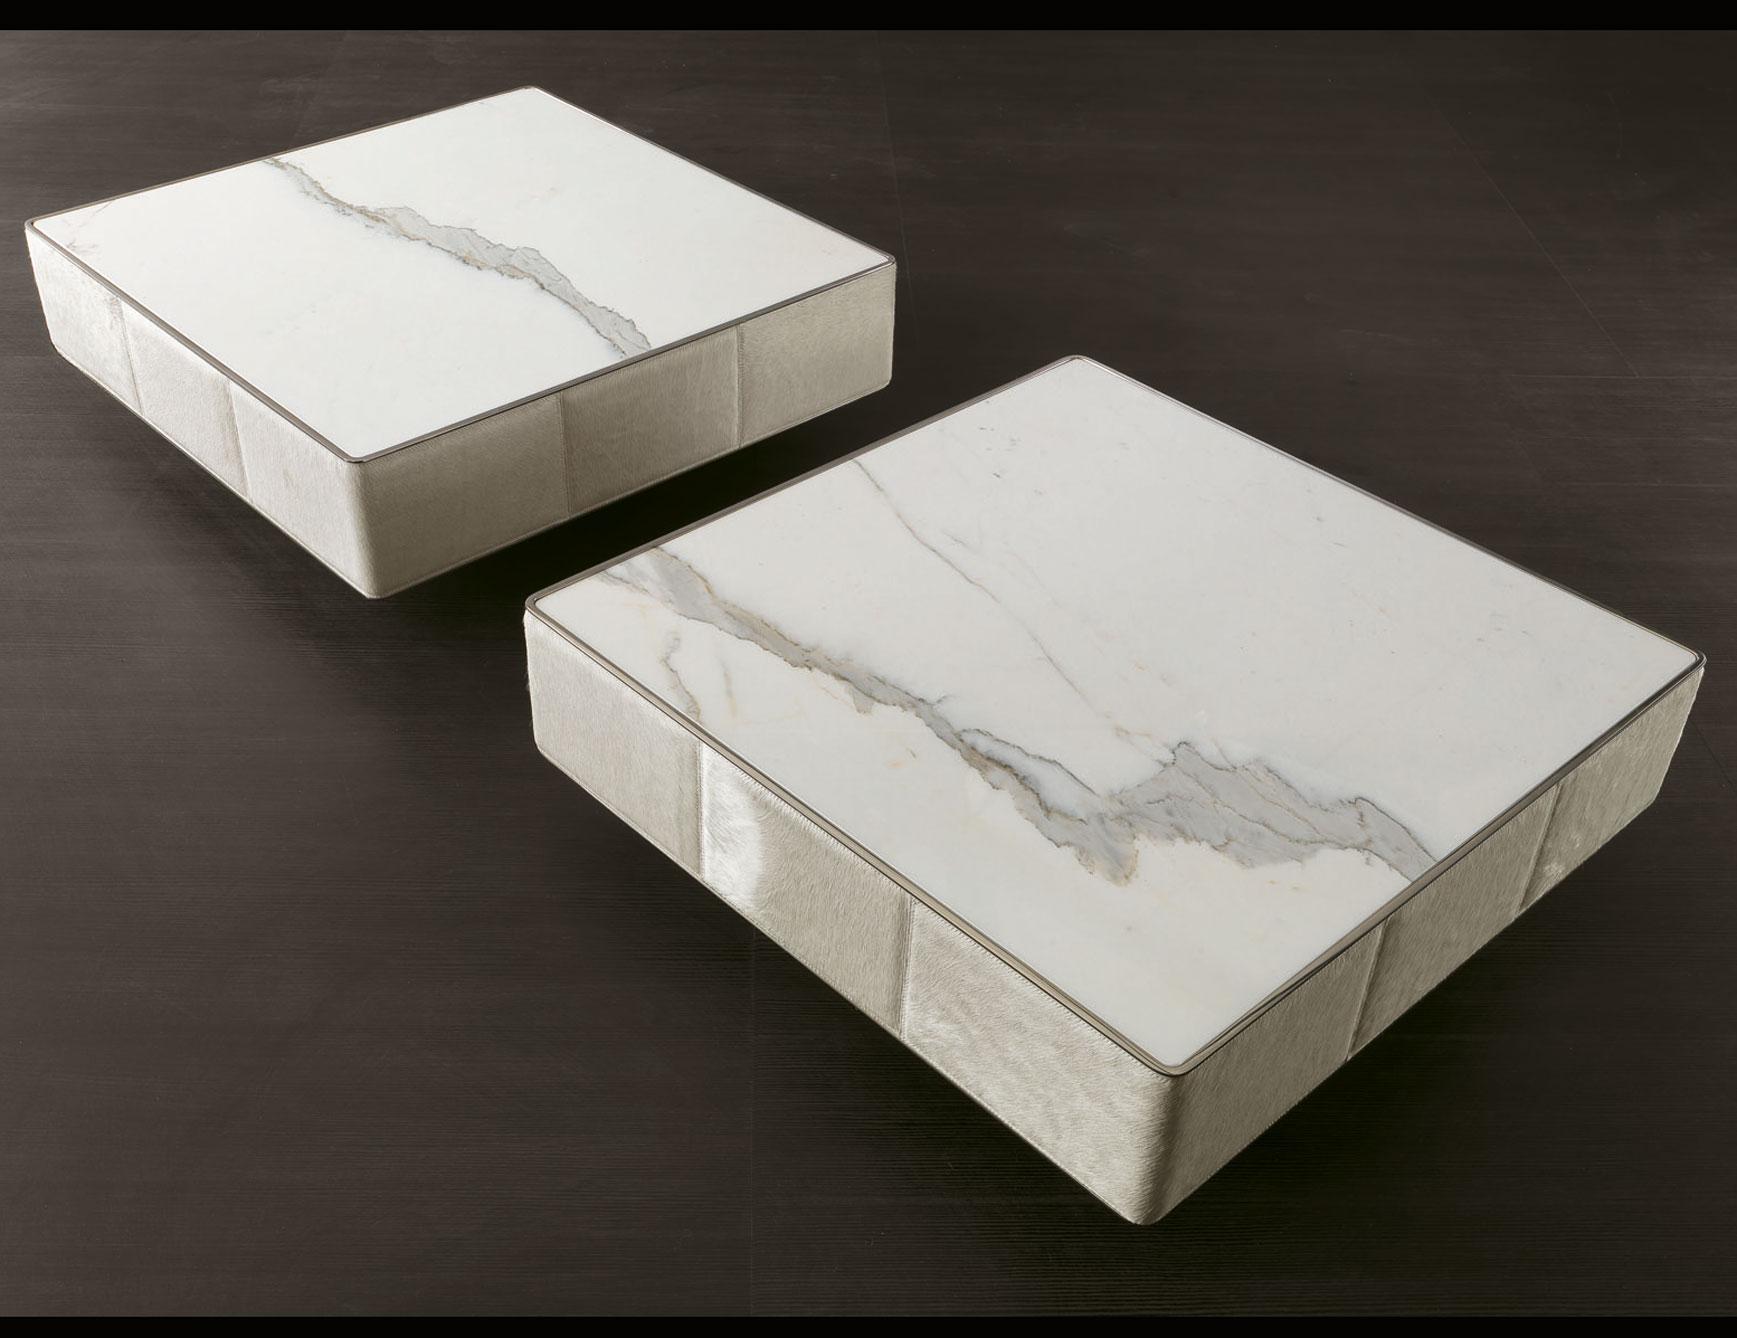 luxury coffee tables Luxury Coffee Tables by Nella Vetrina RQ85tavolino hugo 2